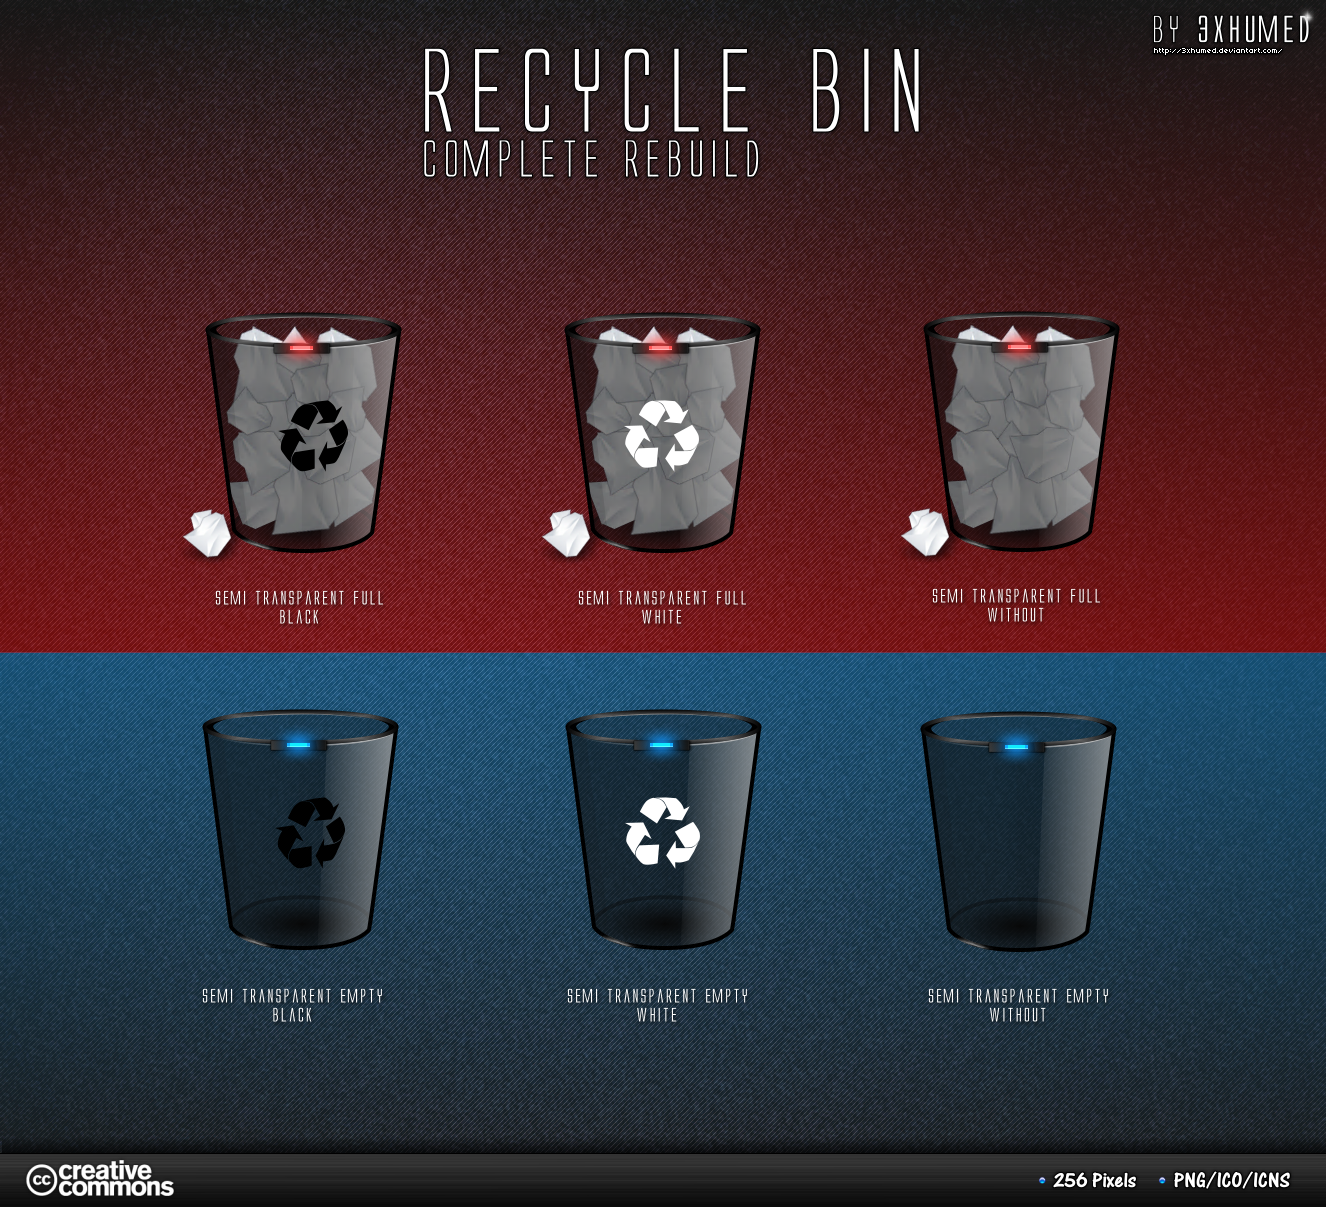 Recycle Bin - Black Version by 3xhumed